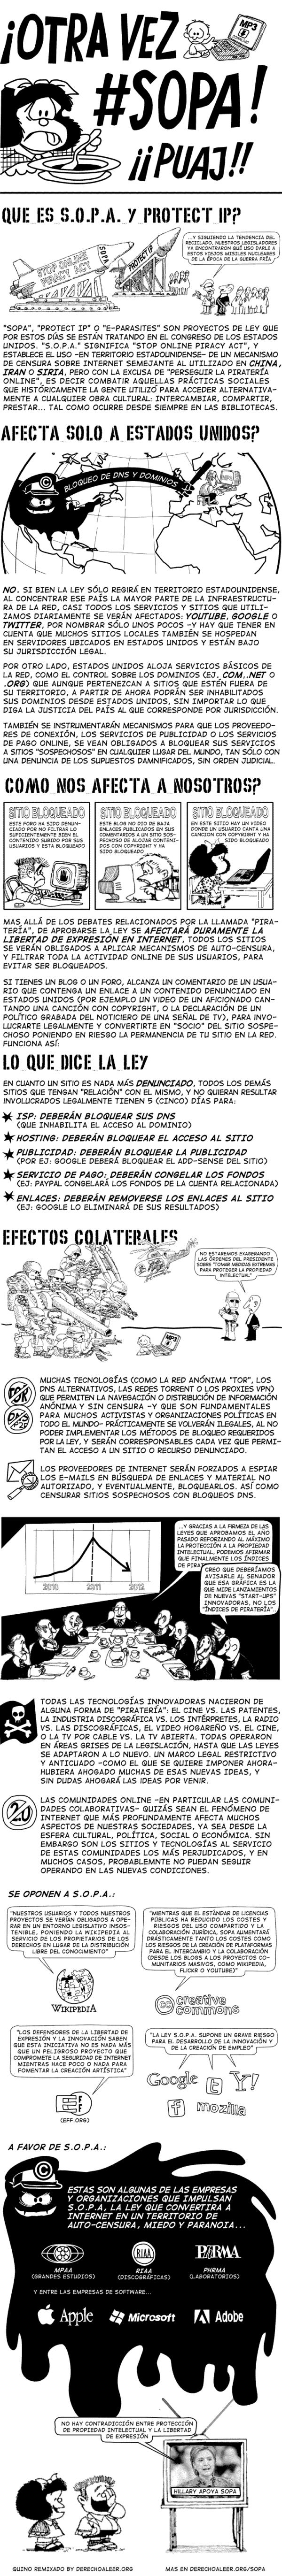 infografia-sopa-mafalda-600x5488